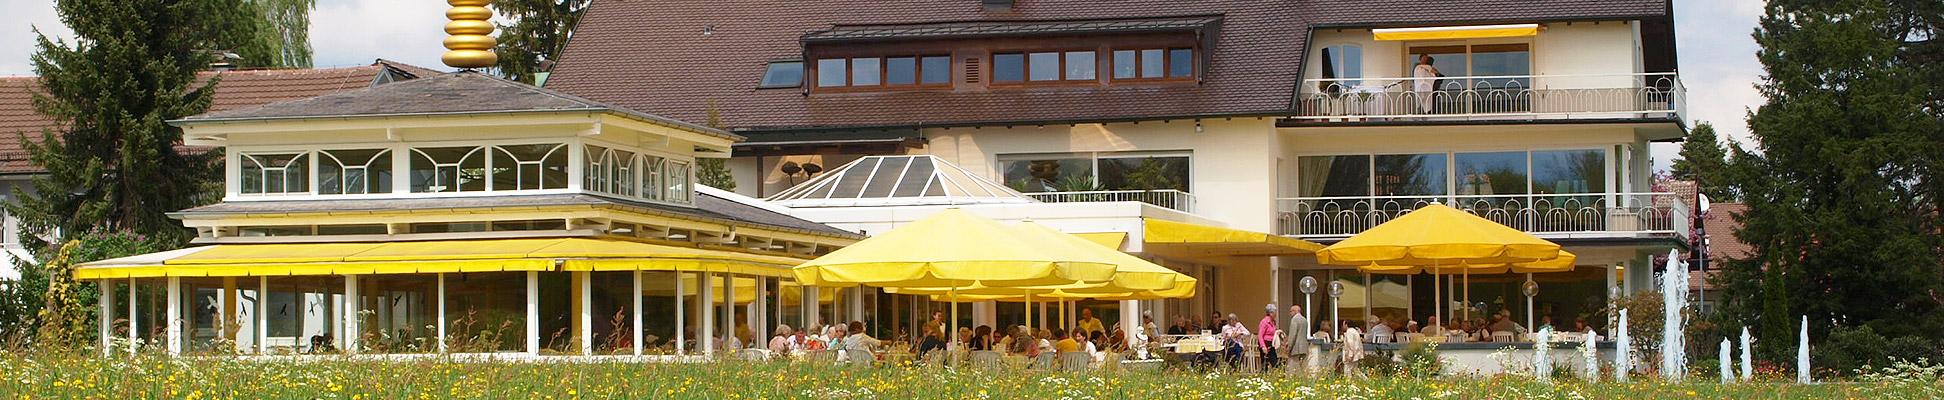 Café Schwermer 02 halb